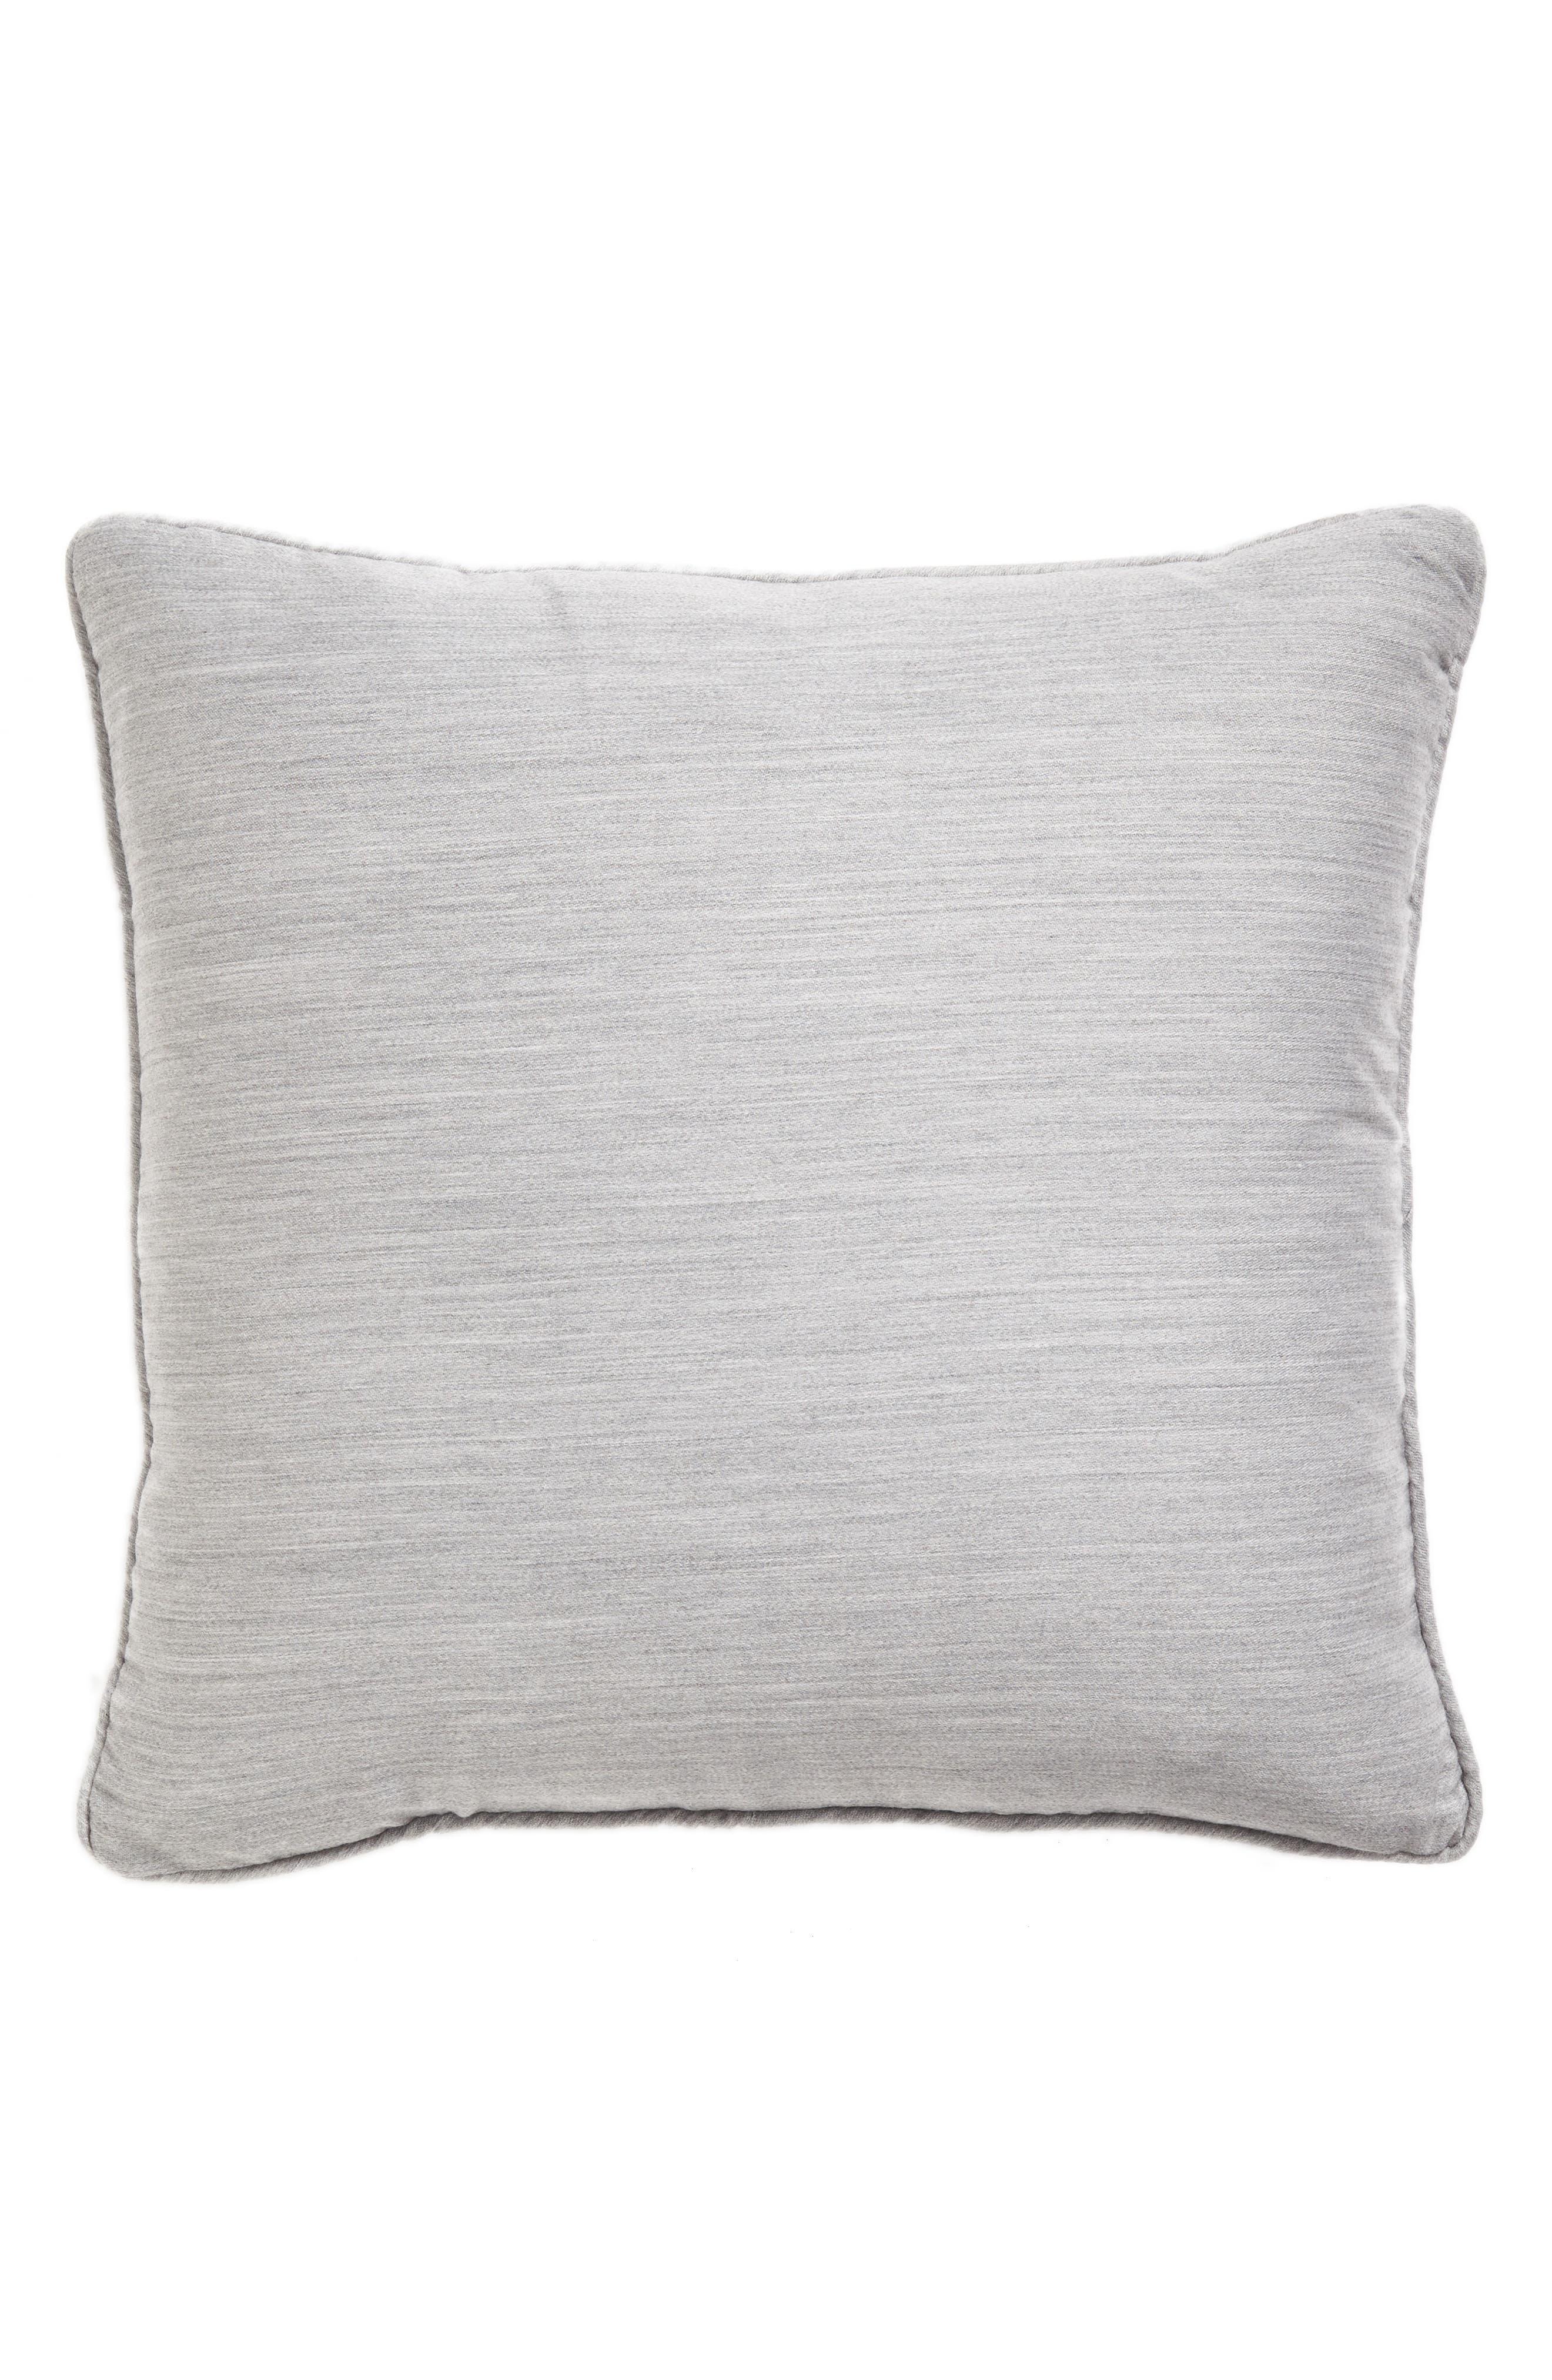 Alternate Image 3  - SFERRA Brione Accent Pillow